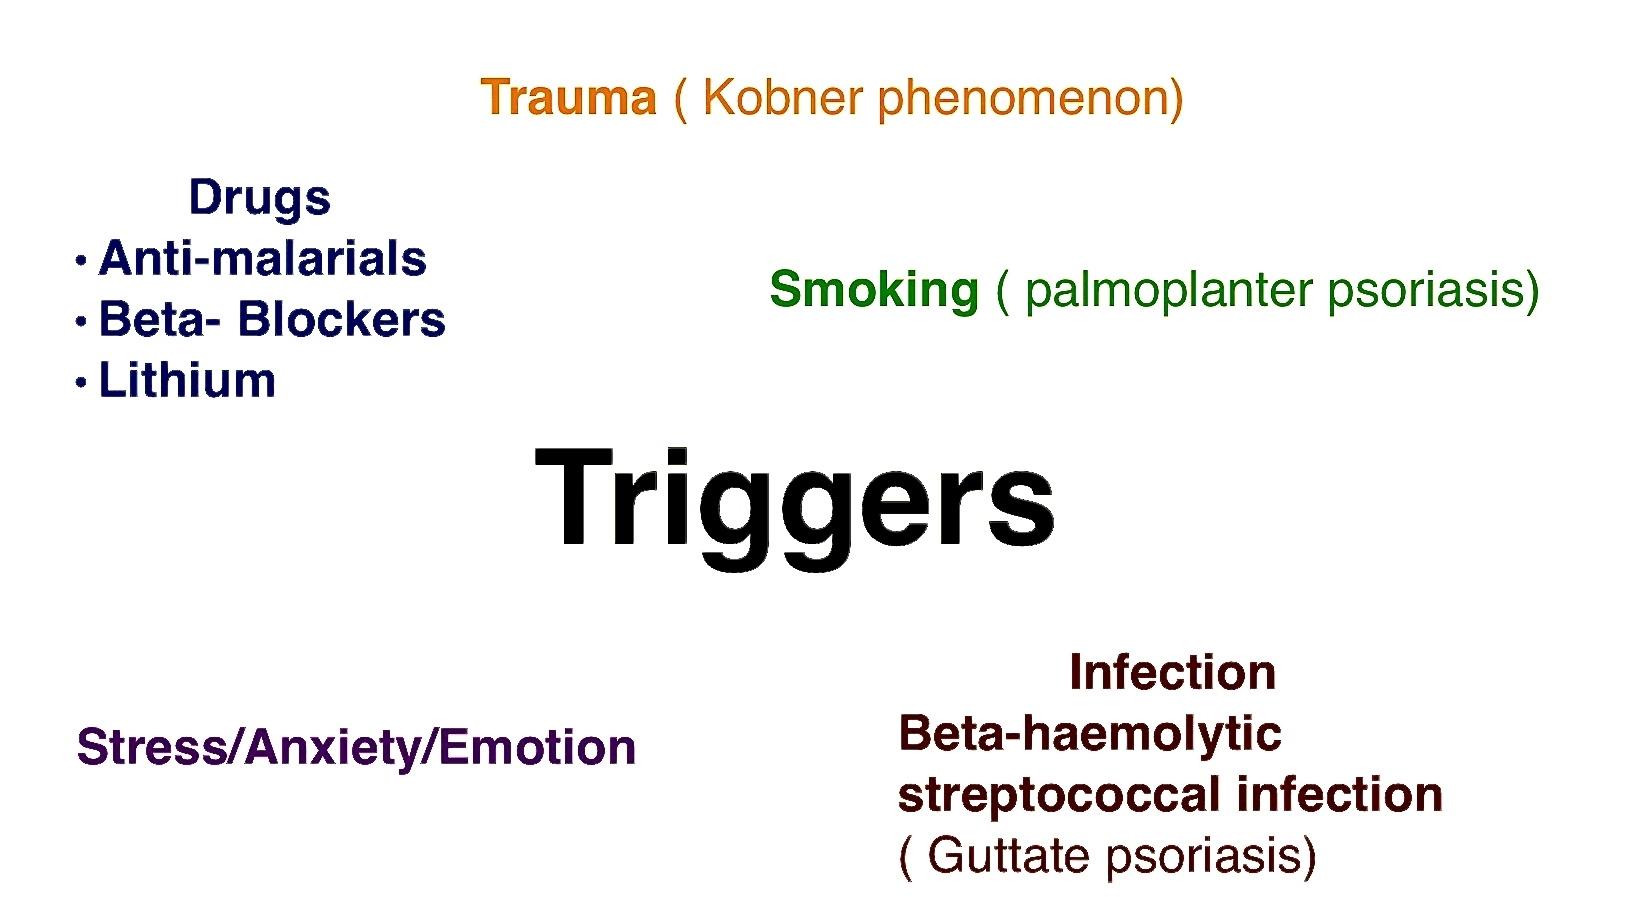 Trigger of psoriasis